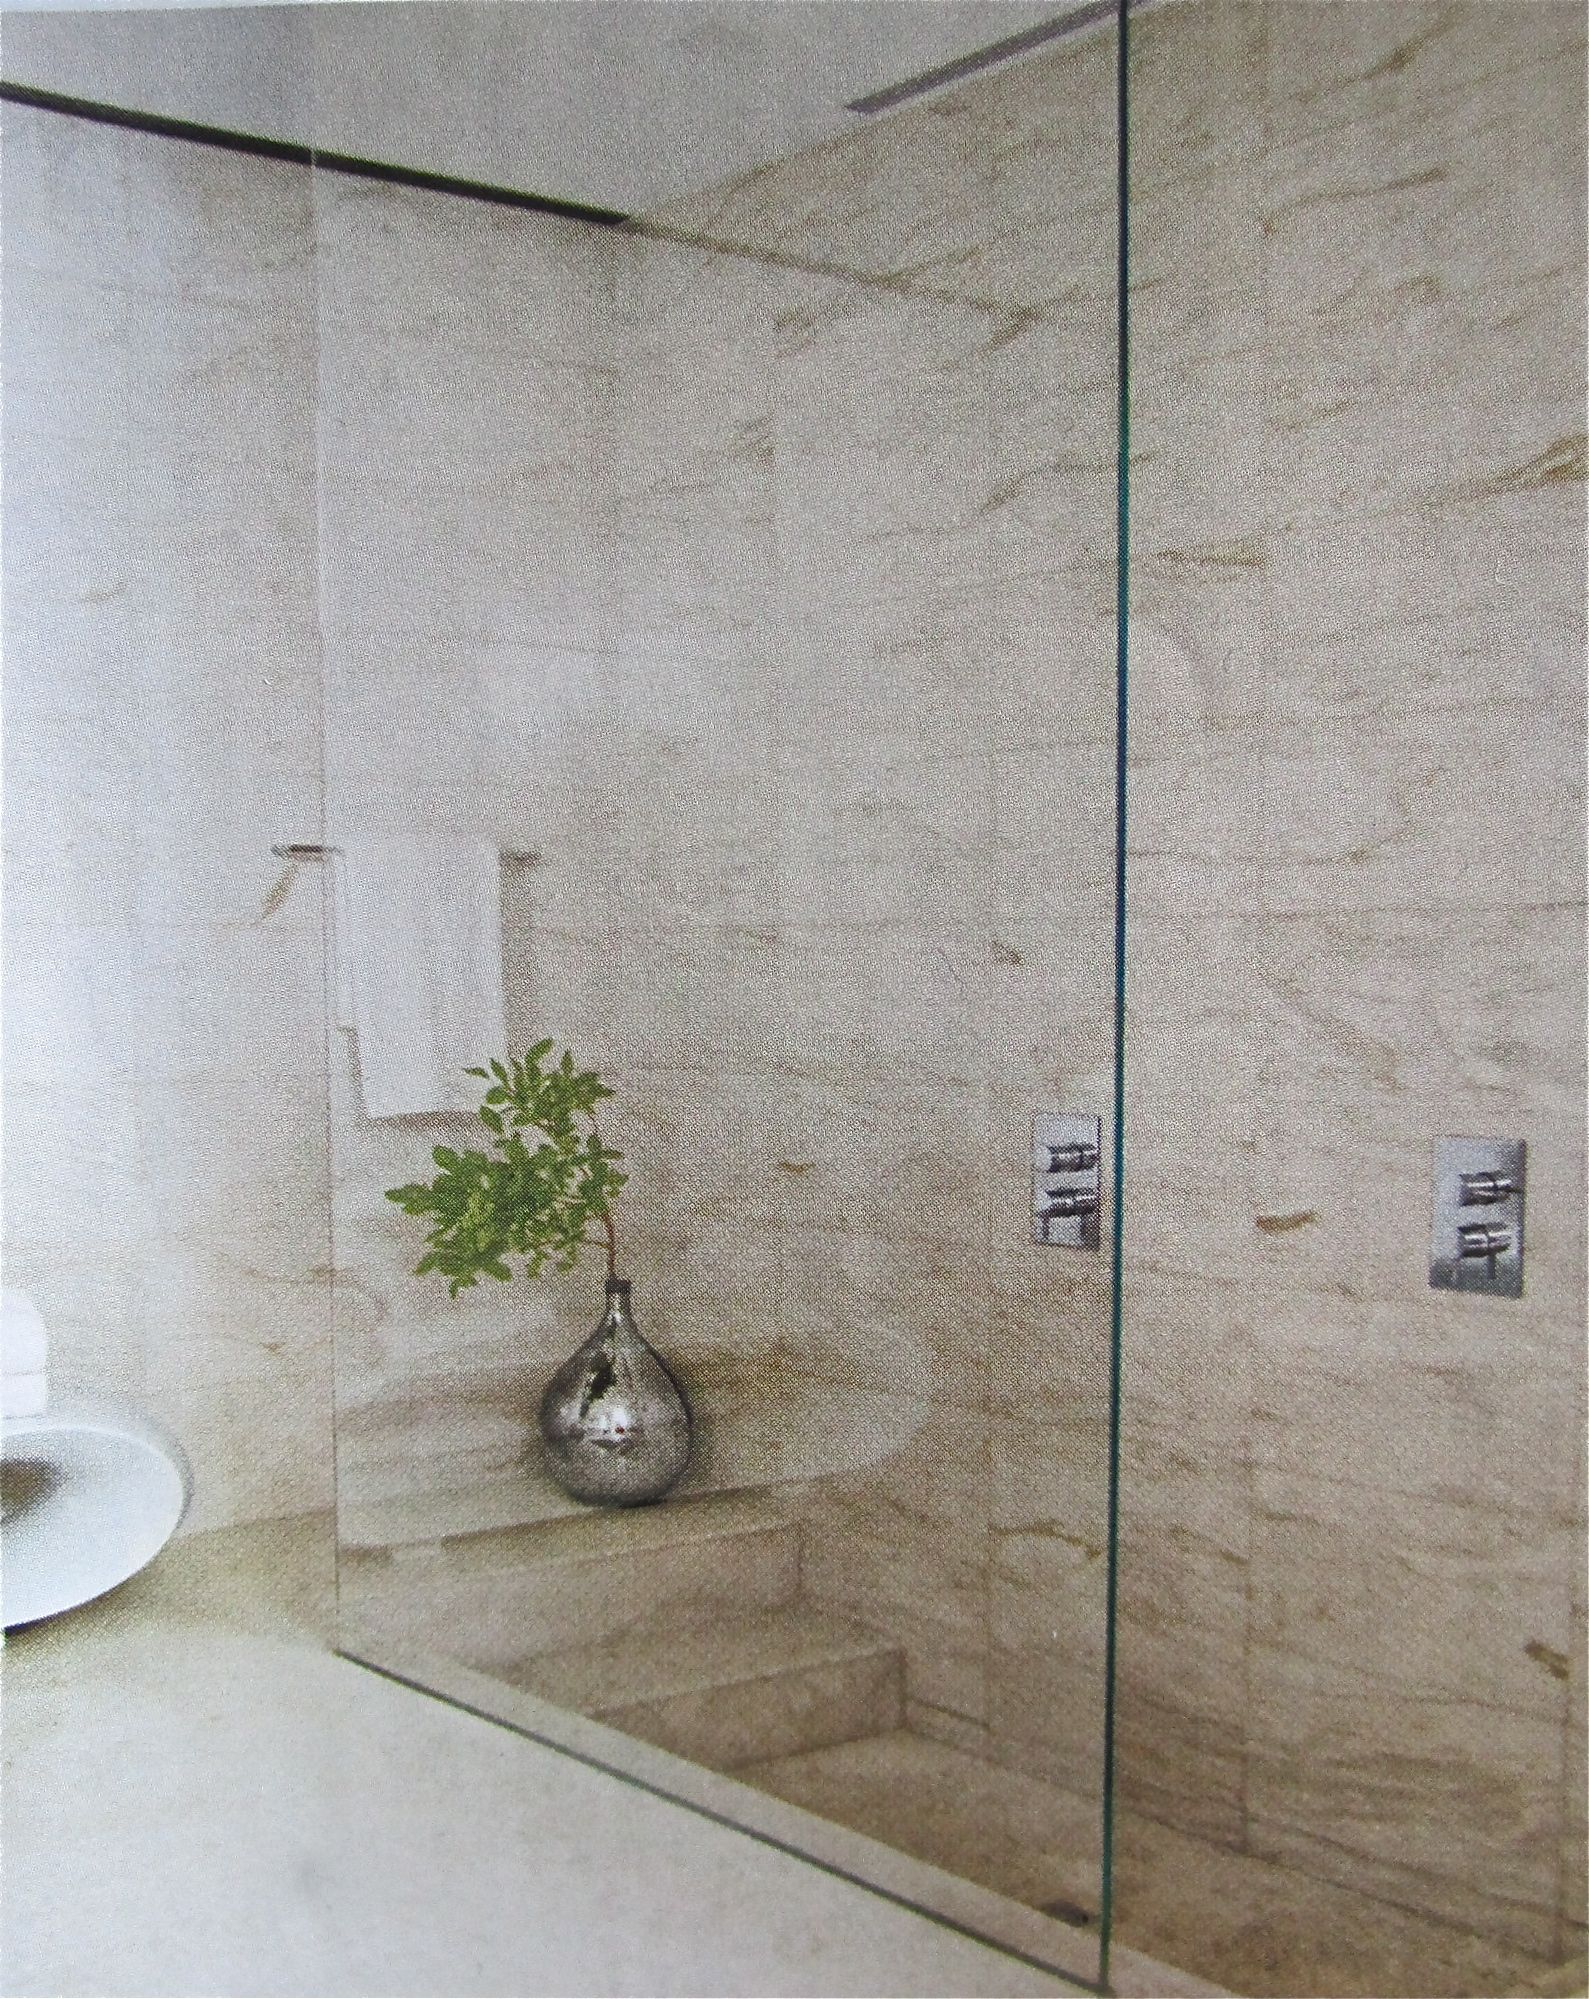 step down shower | making a splash | Pinterest | Bath, Basement ...